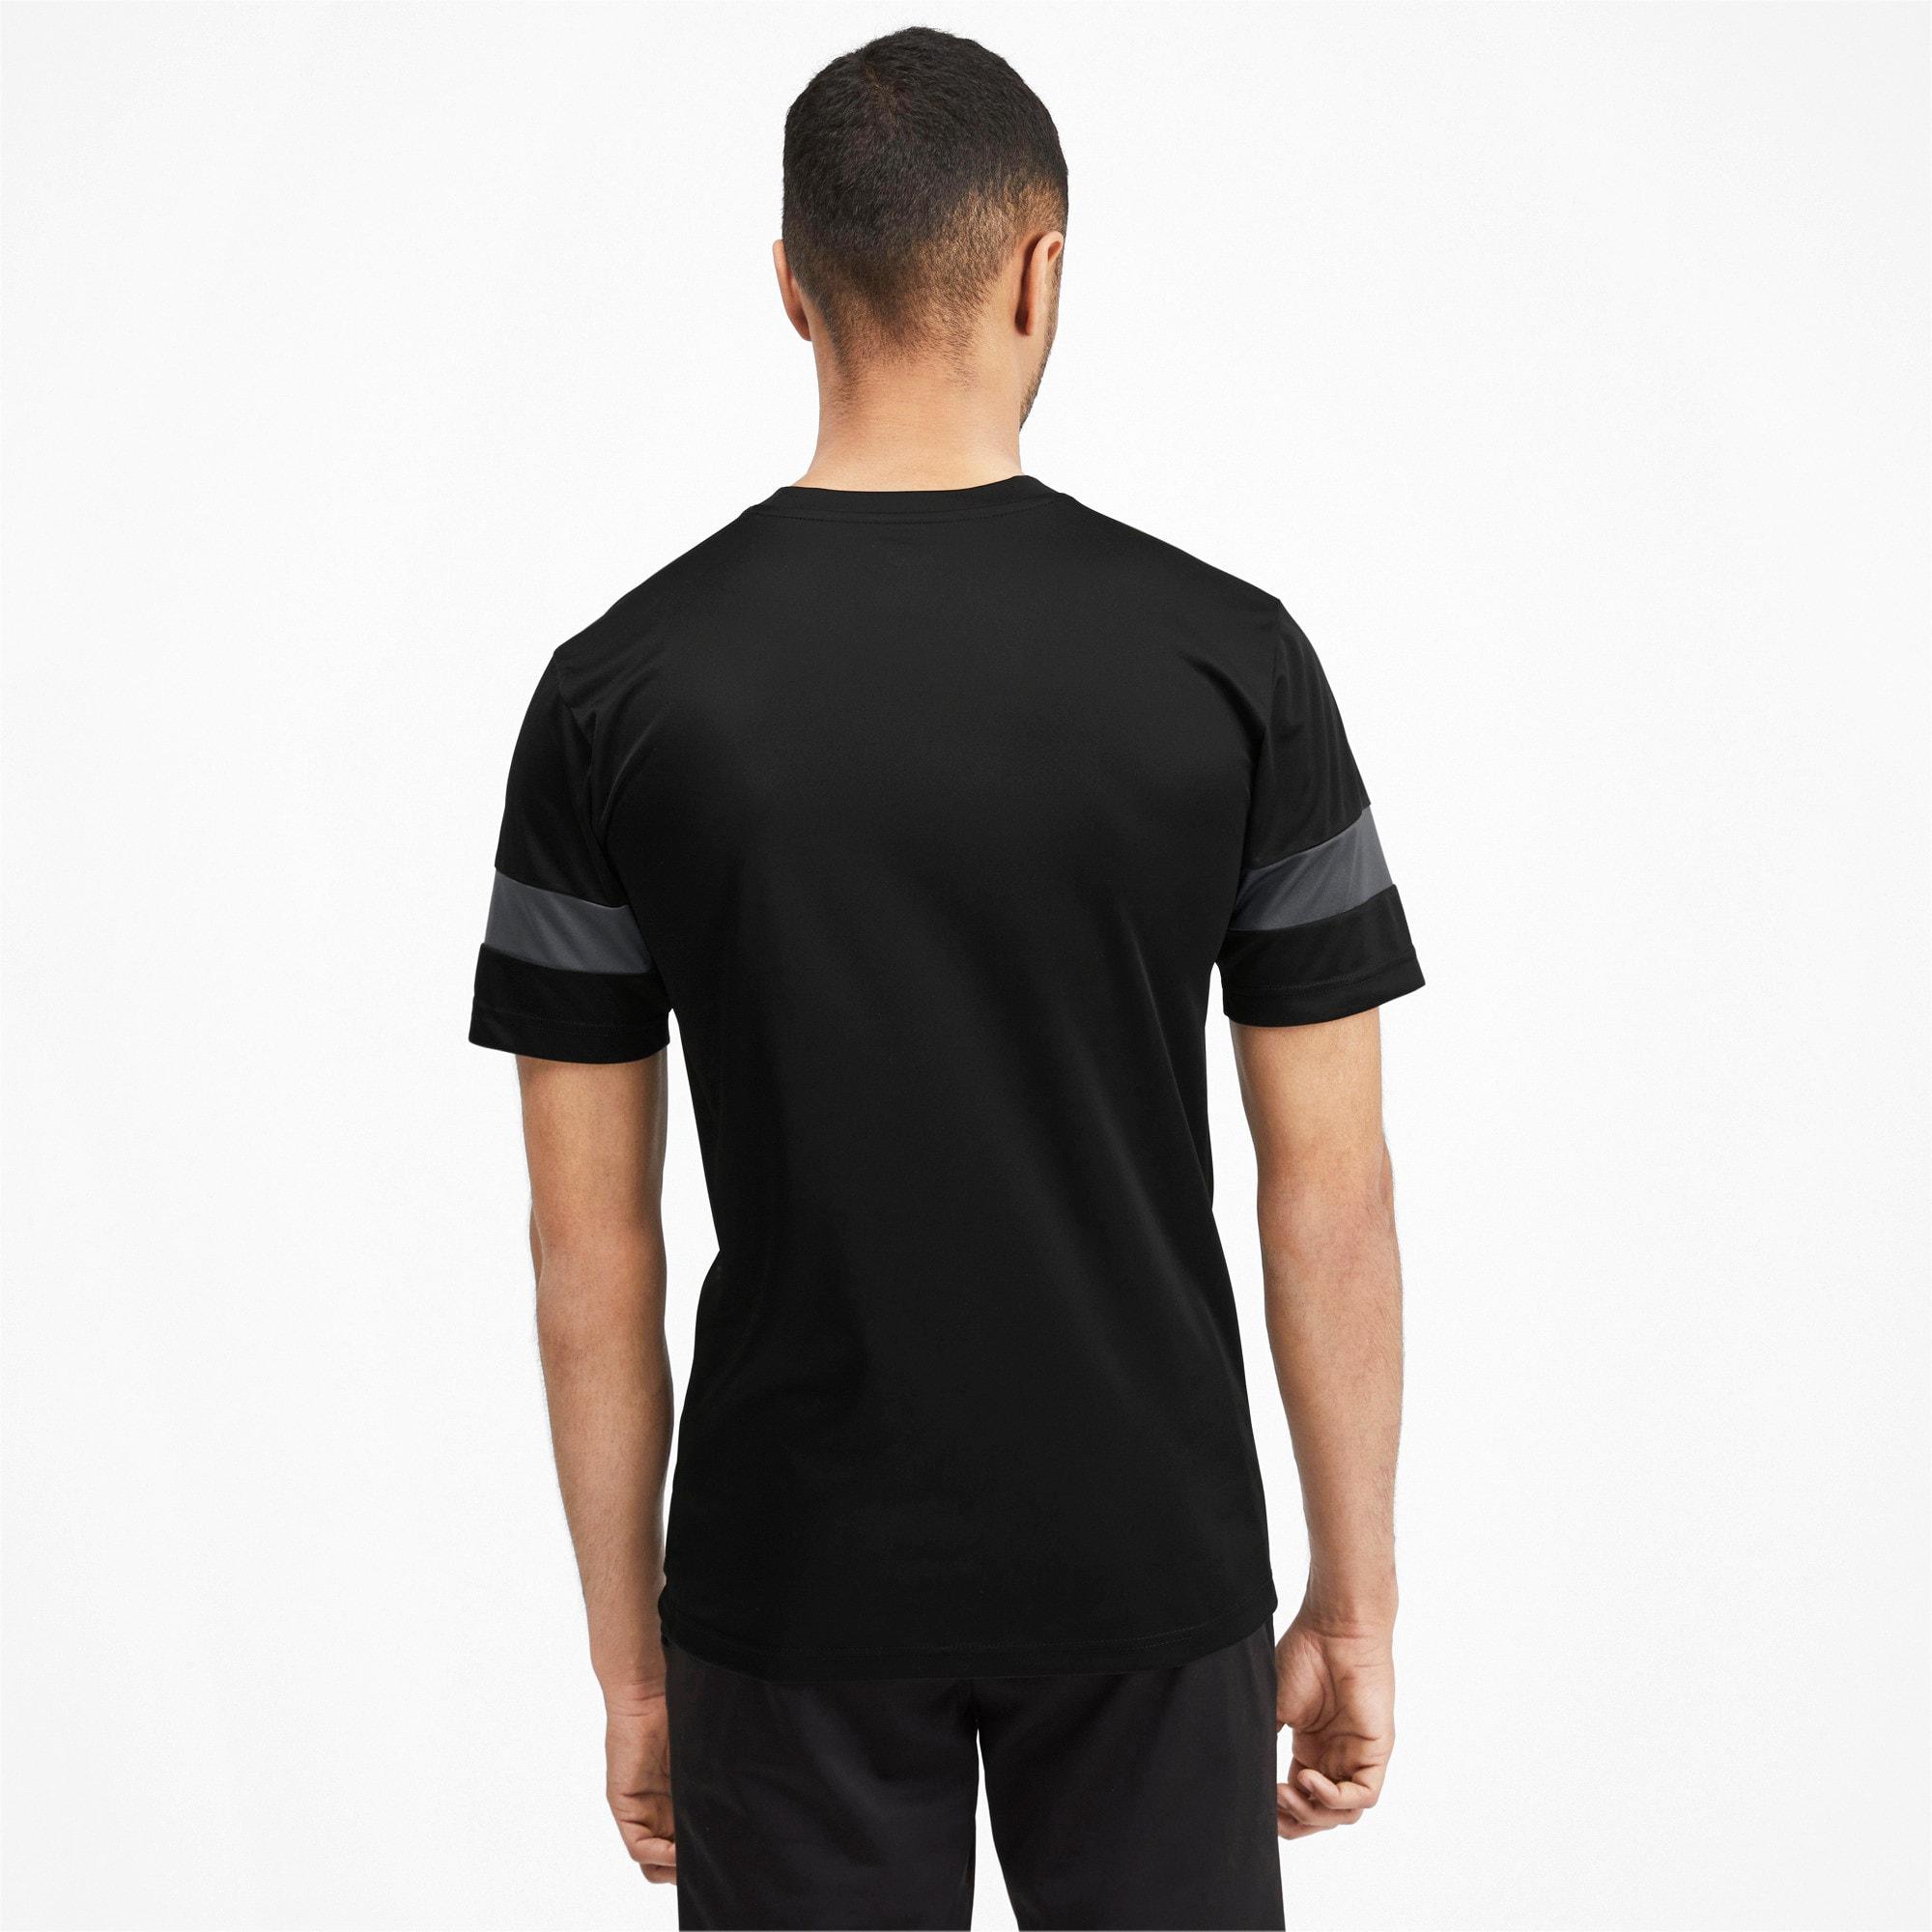 Thumbnail 2 of Trainingsshirt voor heren, Puma Black-Asphalt, medium